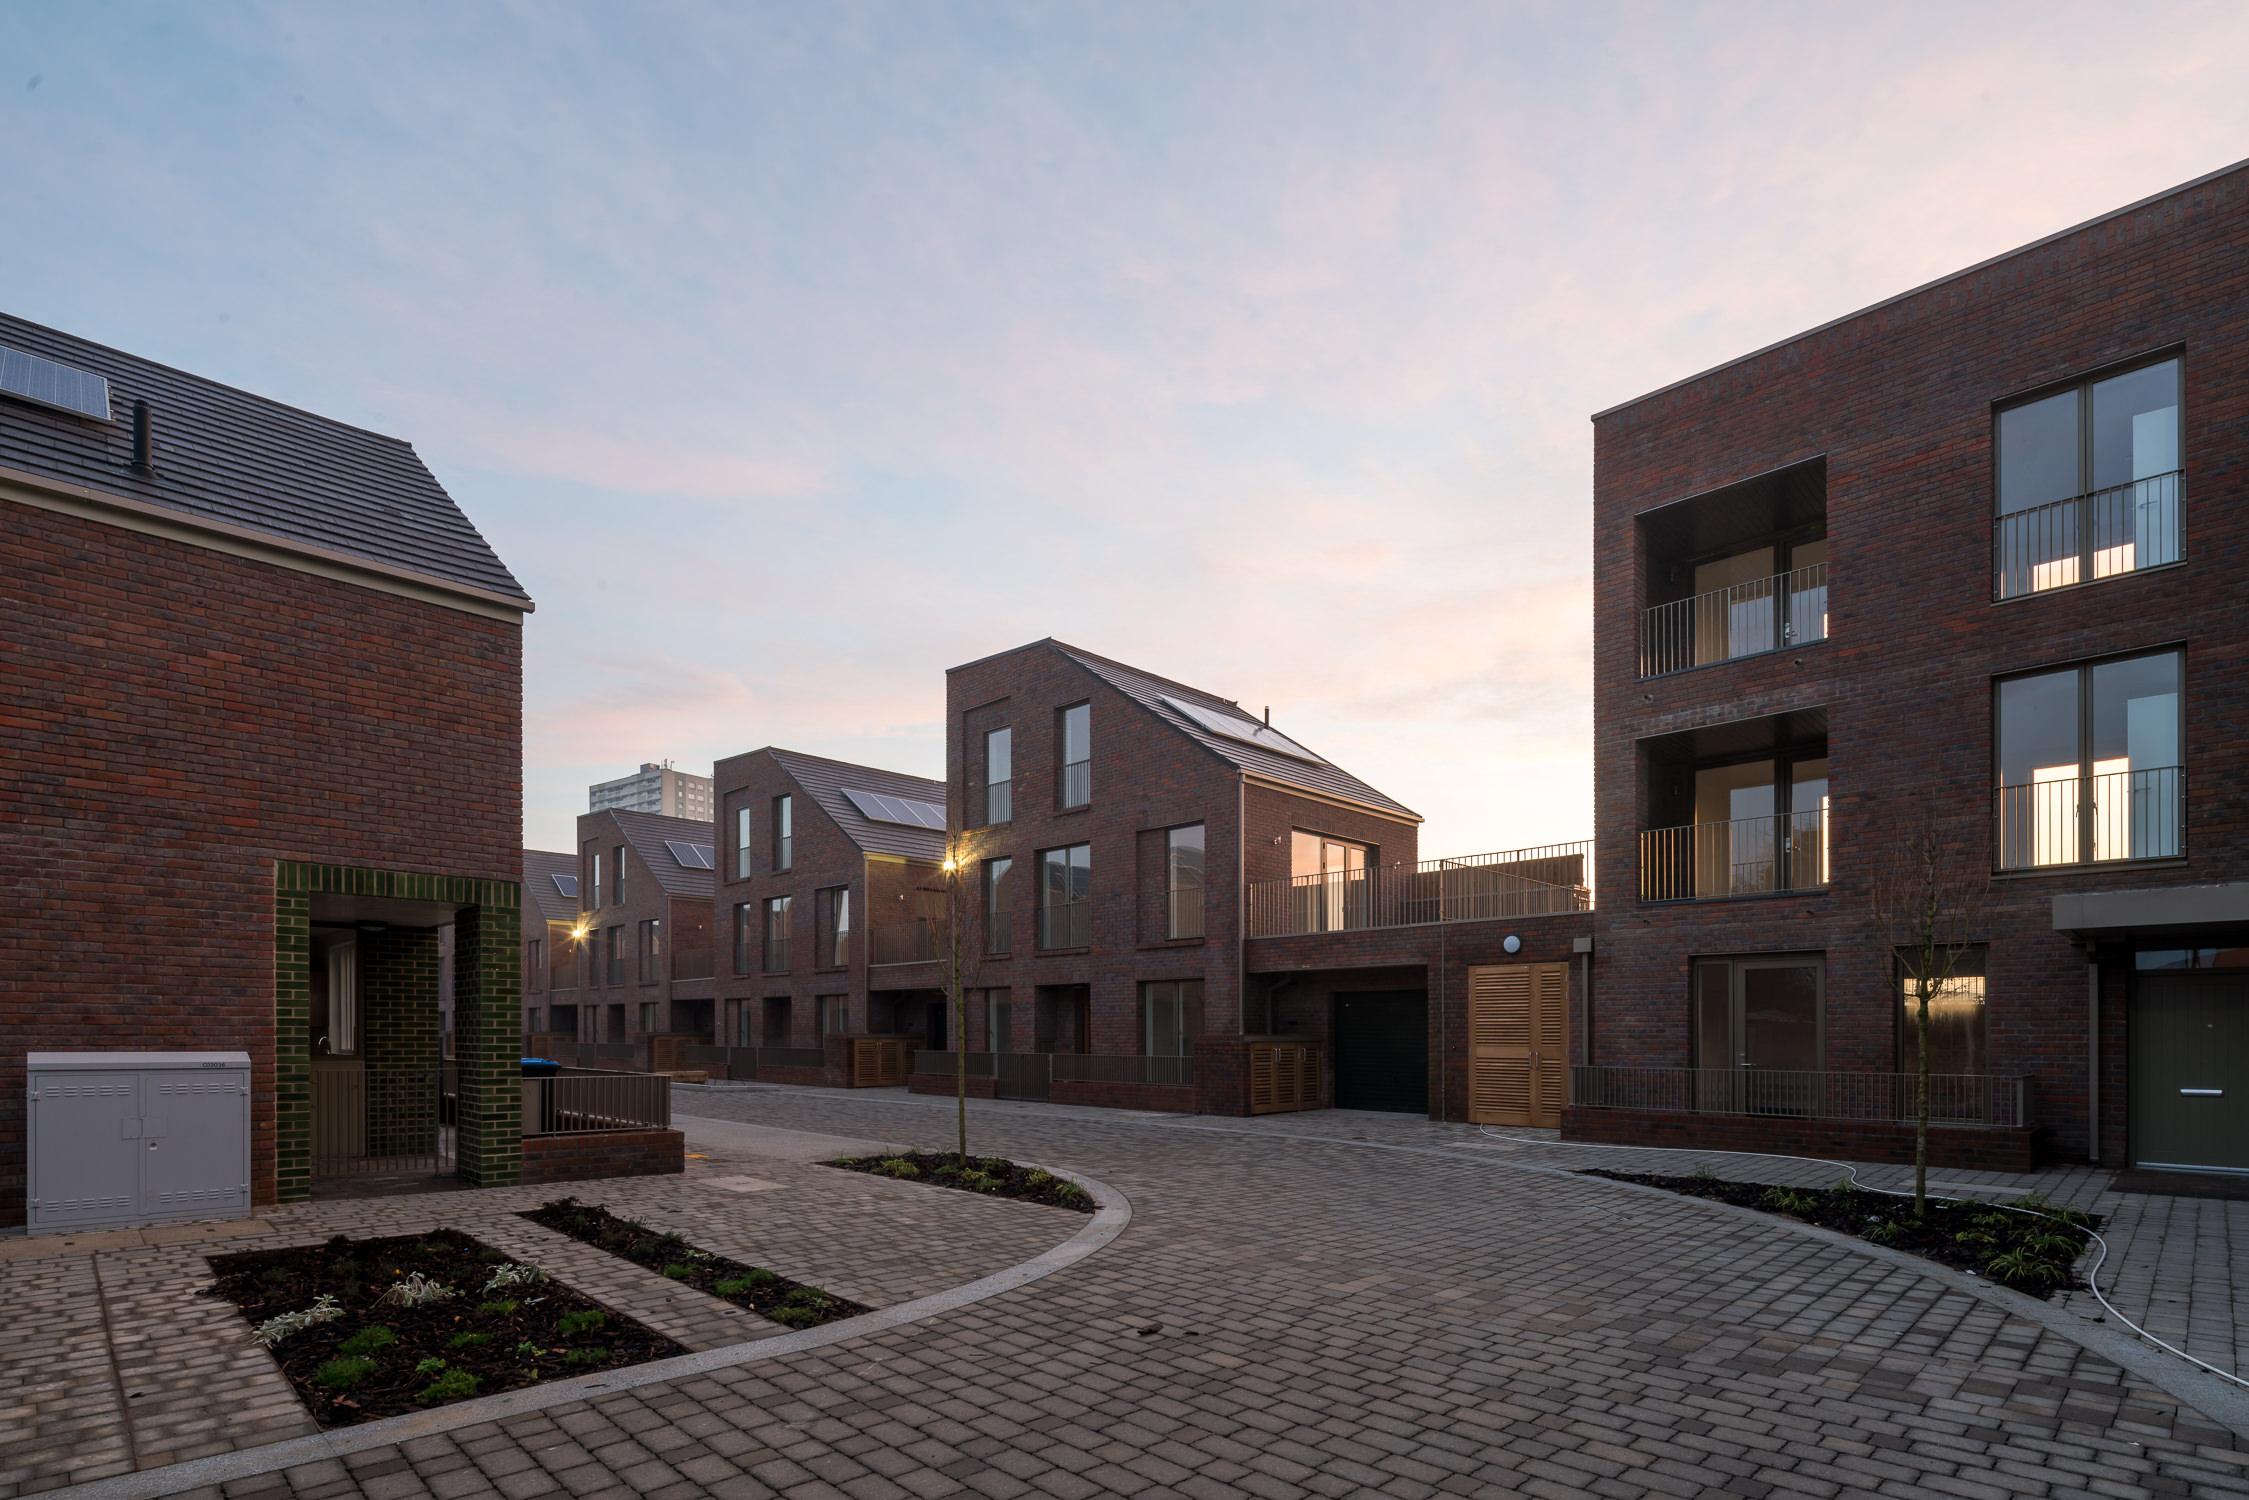 mark-hadden-architecture-photographer-architectuur-interieur-fotografie-london-amsterdam-Dujardin Mews-030.jpg